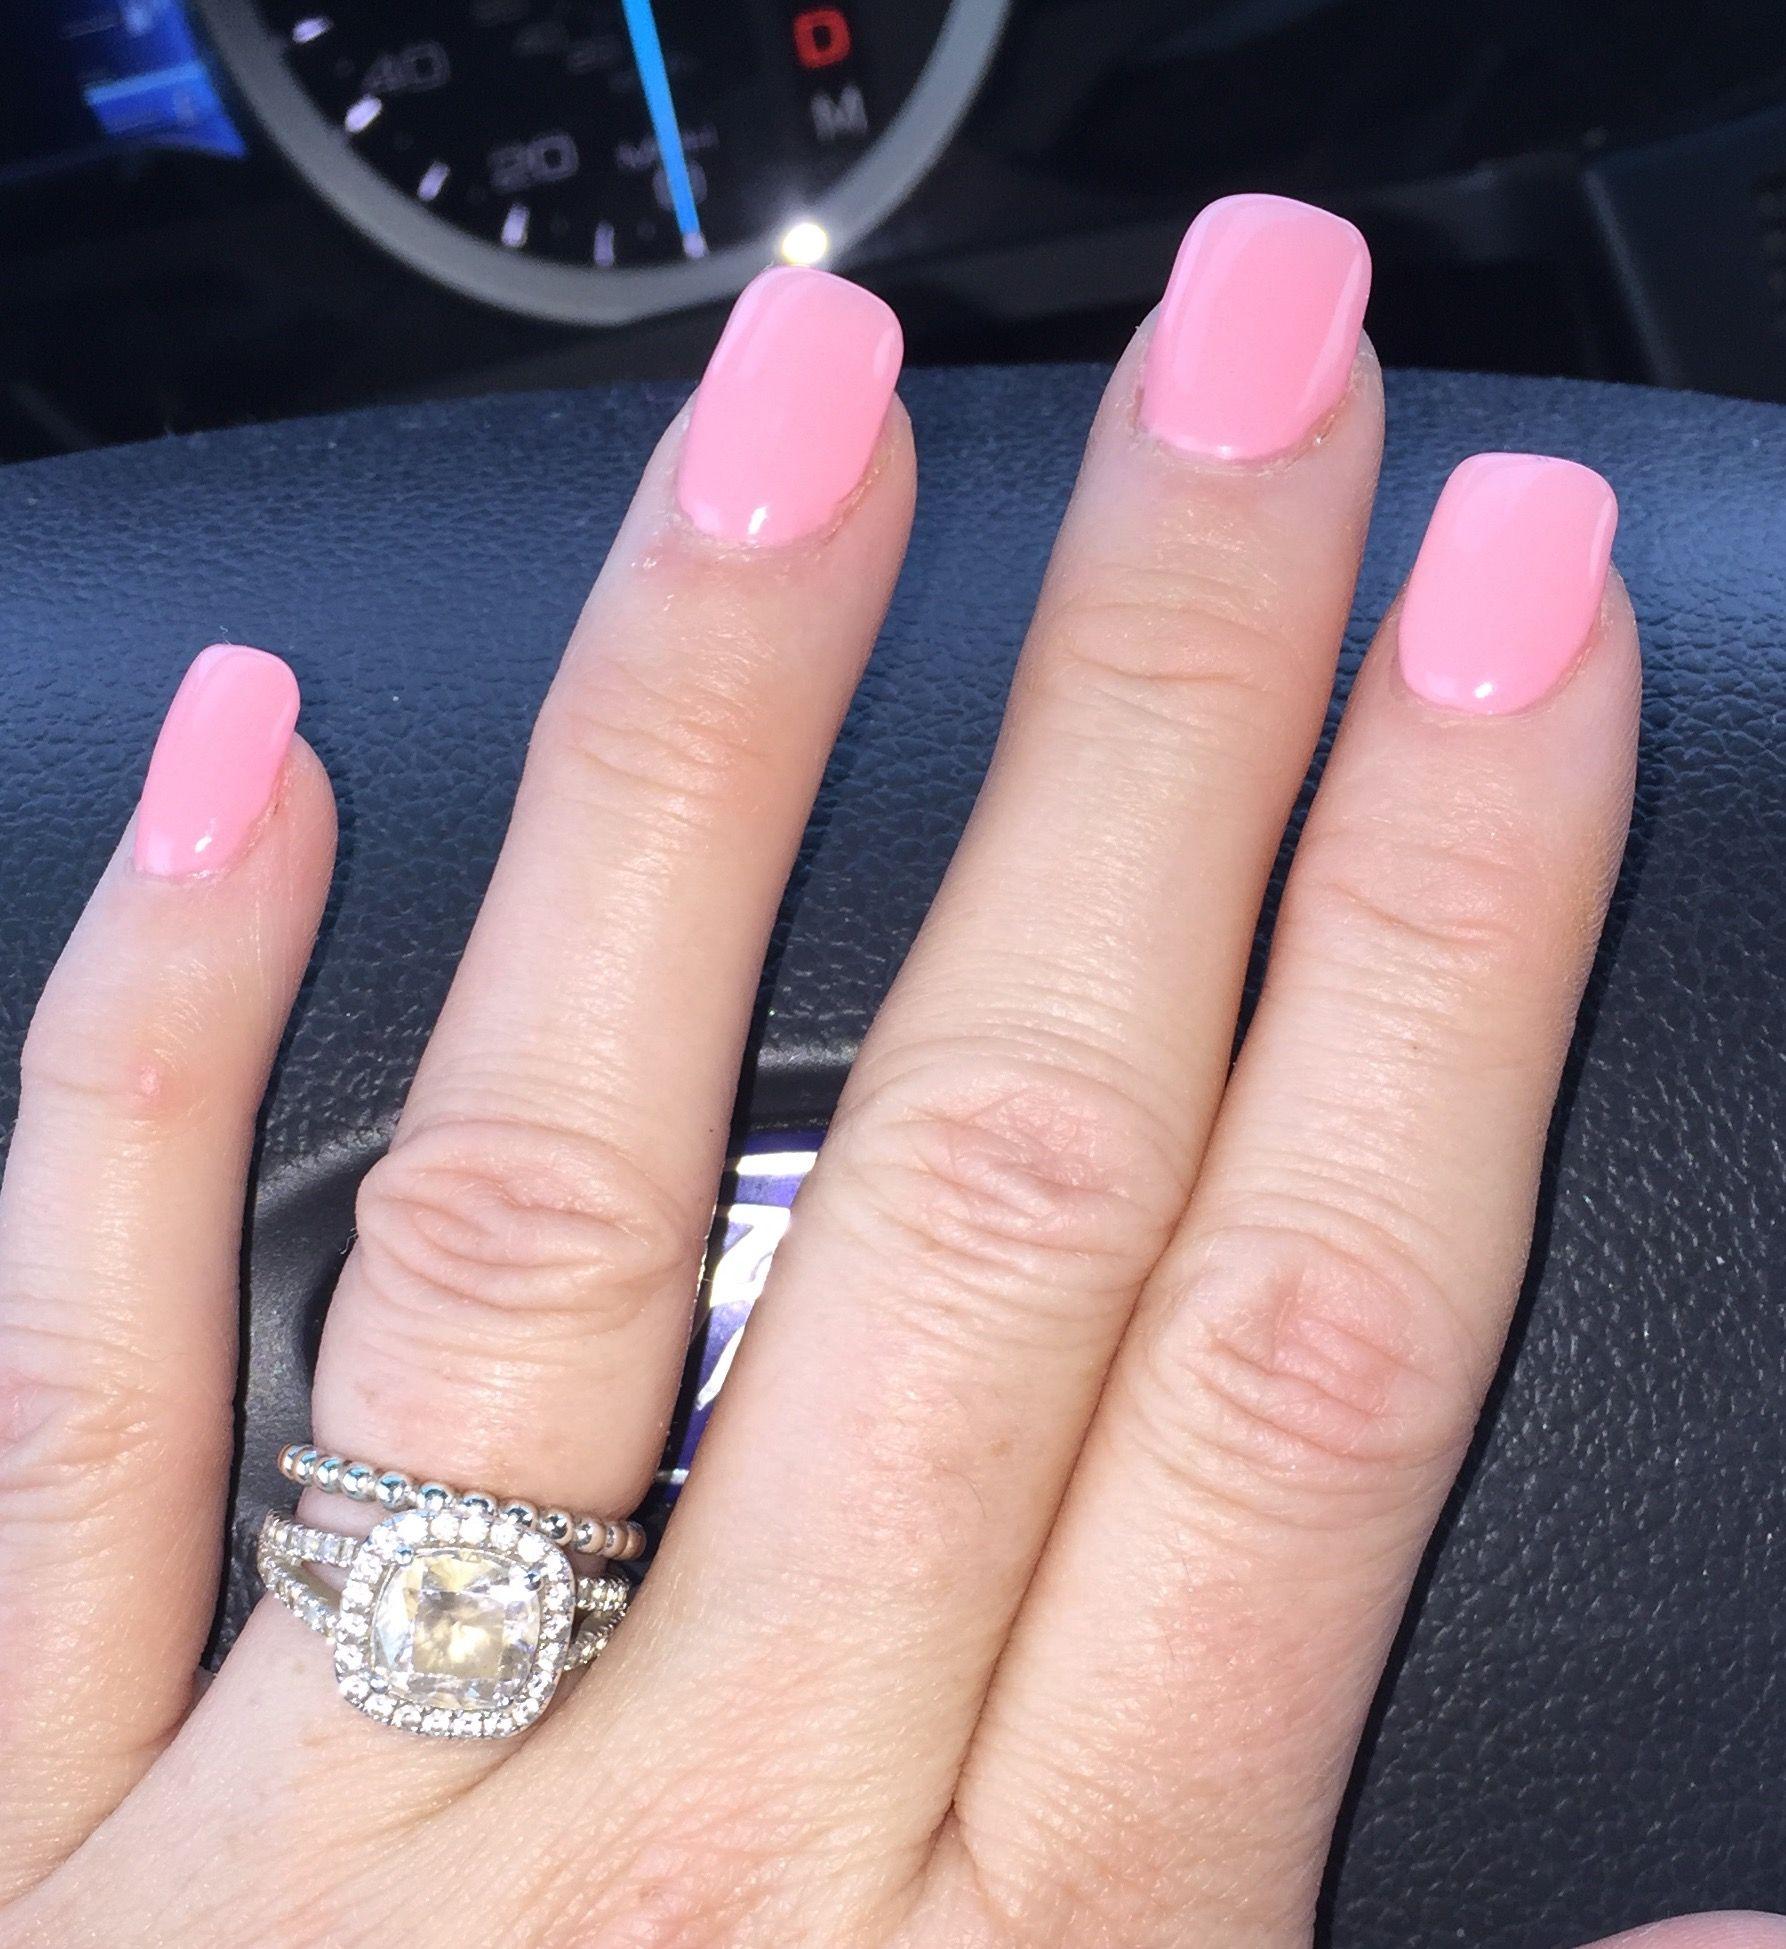 Kiara Sky #408 chatterbox ~my new fave!~ Paige\'s nails | Nails ...